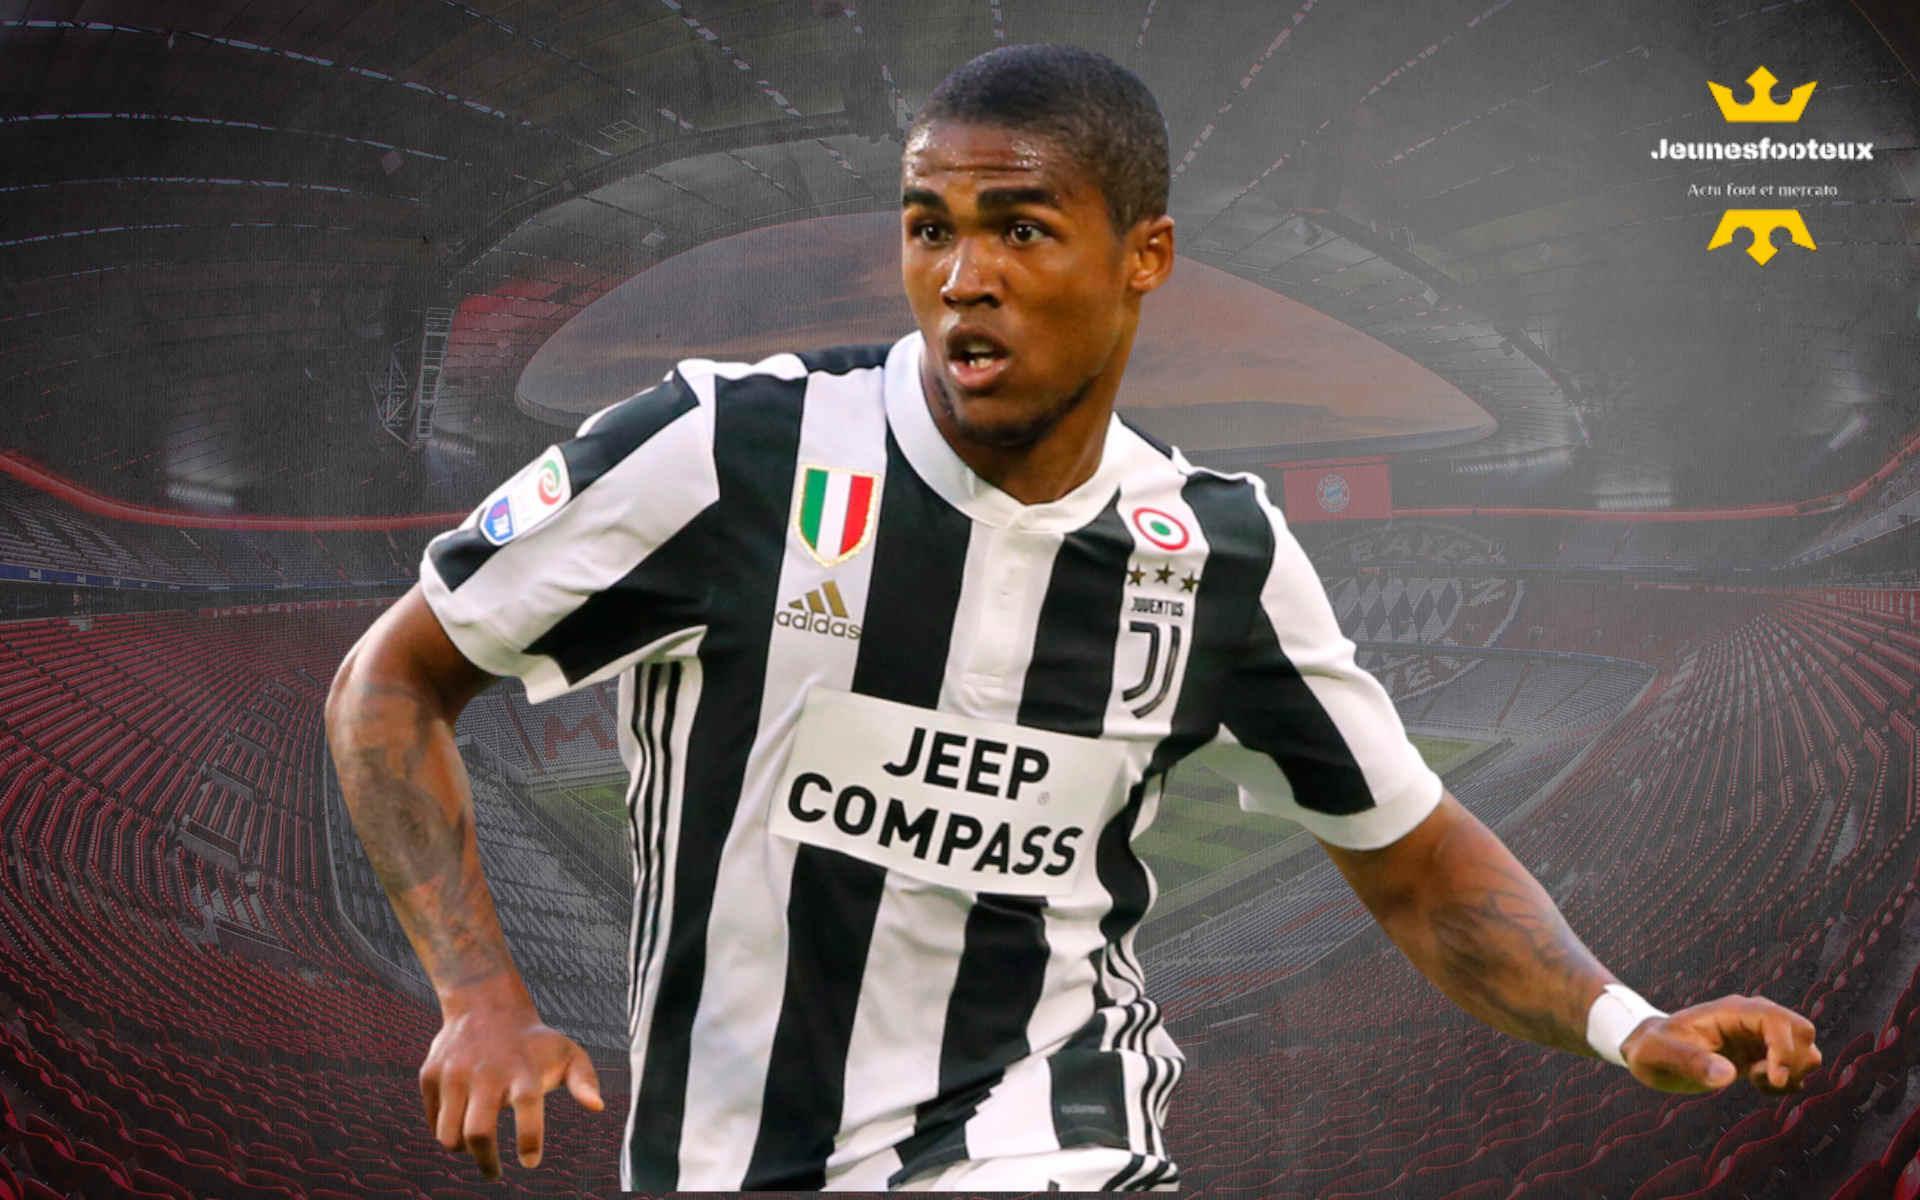 Manchester United - Mercato : les Red Devils tentés par un attaquant de la Juventus ?